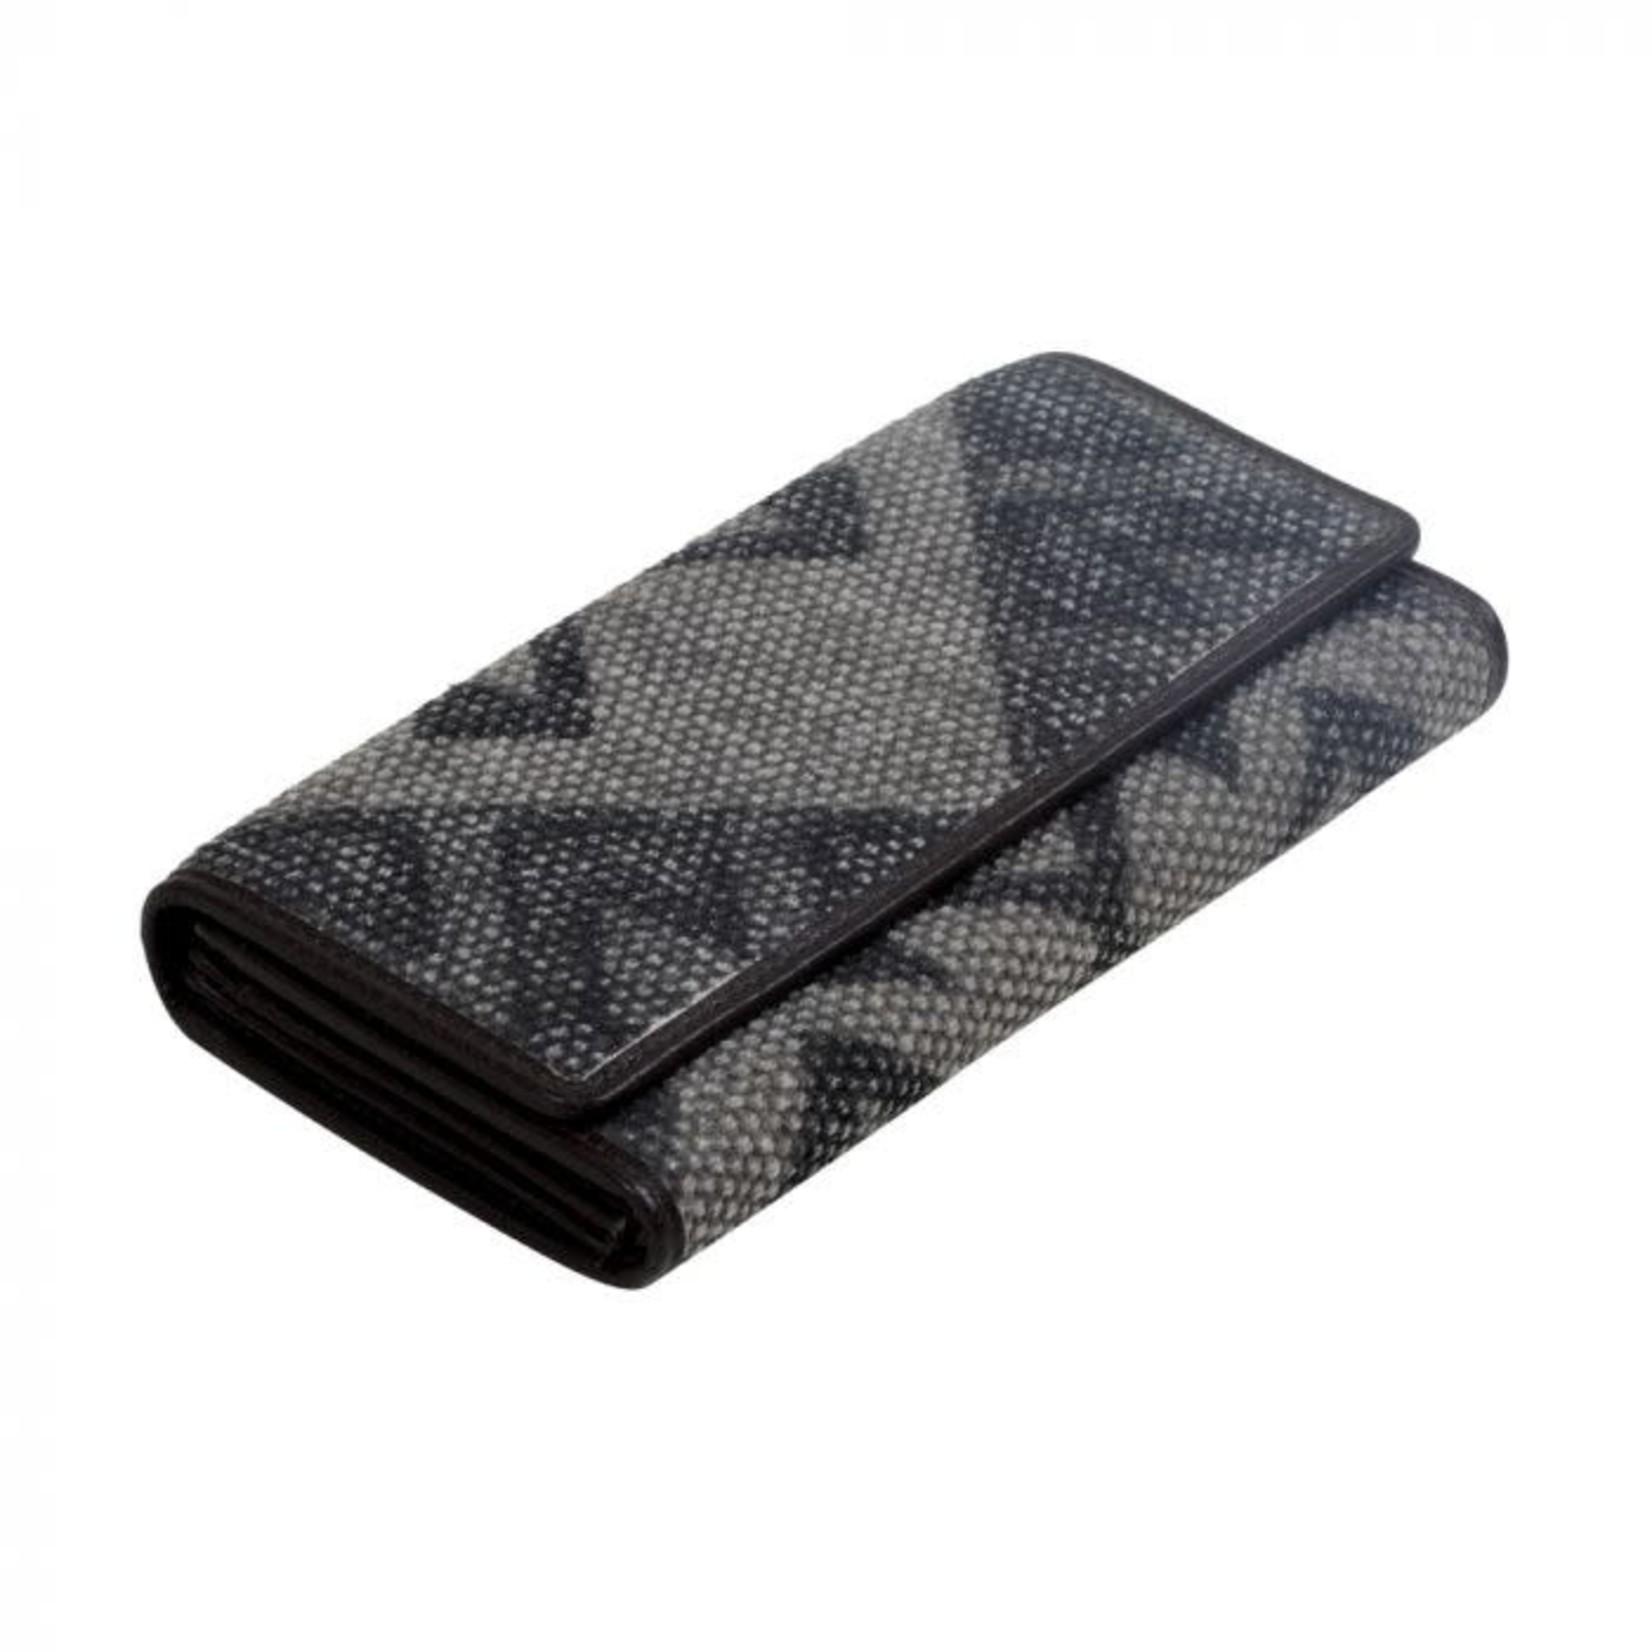 Myra Bag Wallet: Smart Move